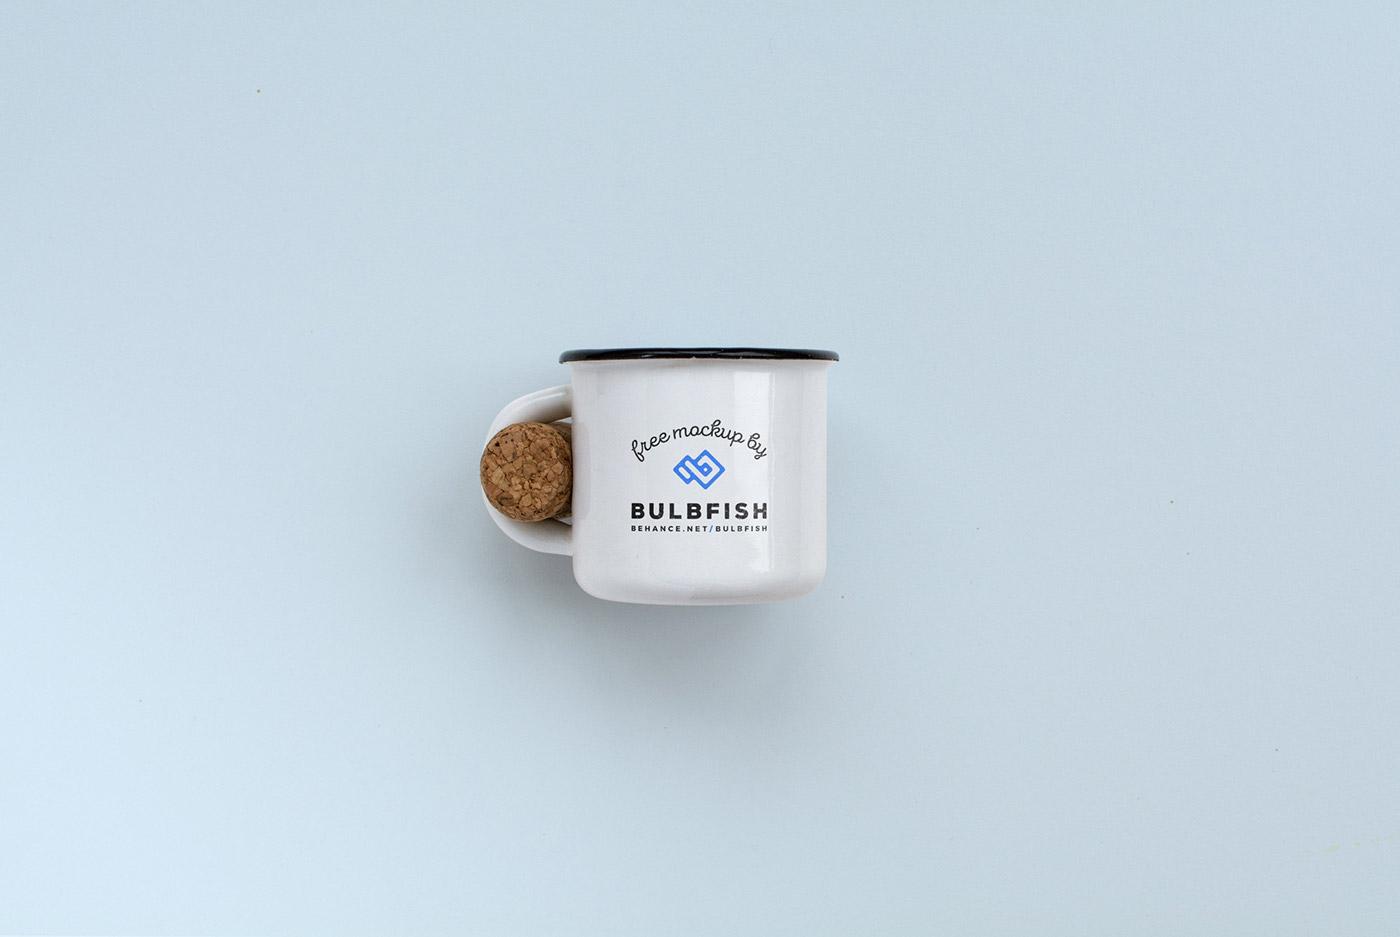 Mockup mock-up free freebie freebies Mug  cup bulbfish metal cork customizable logo coffe